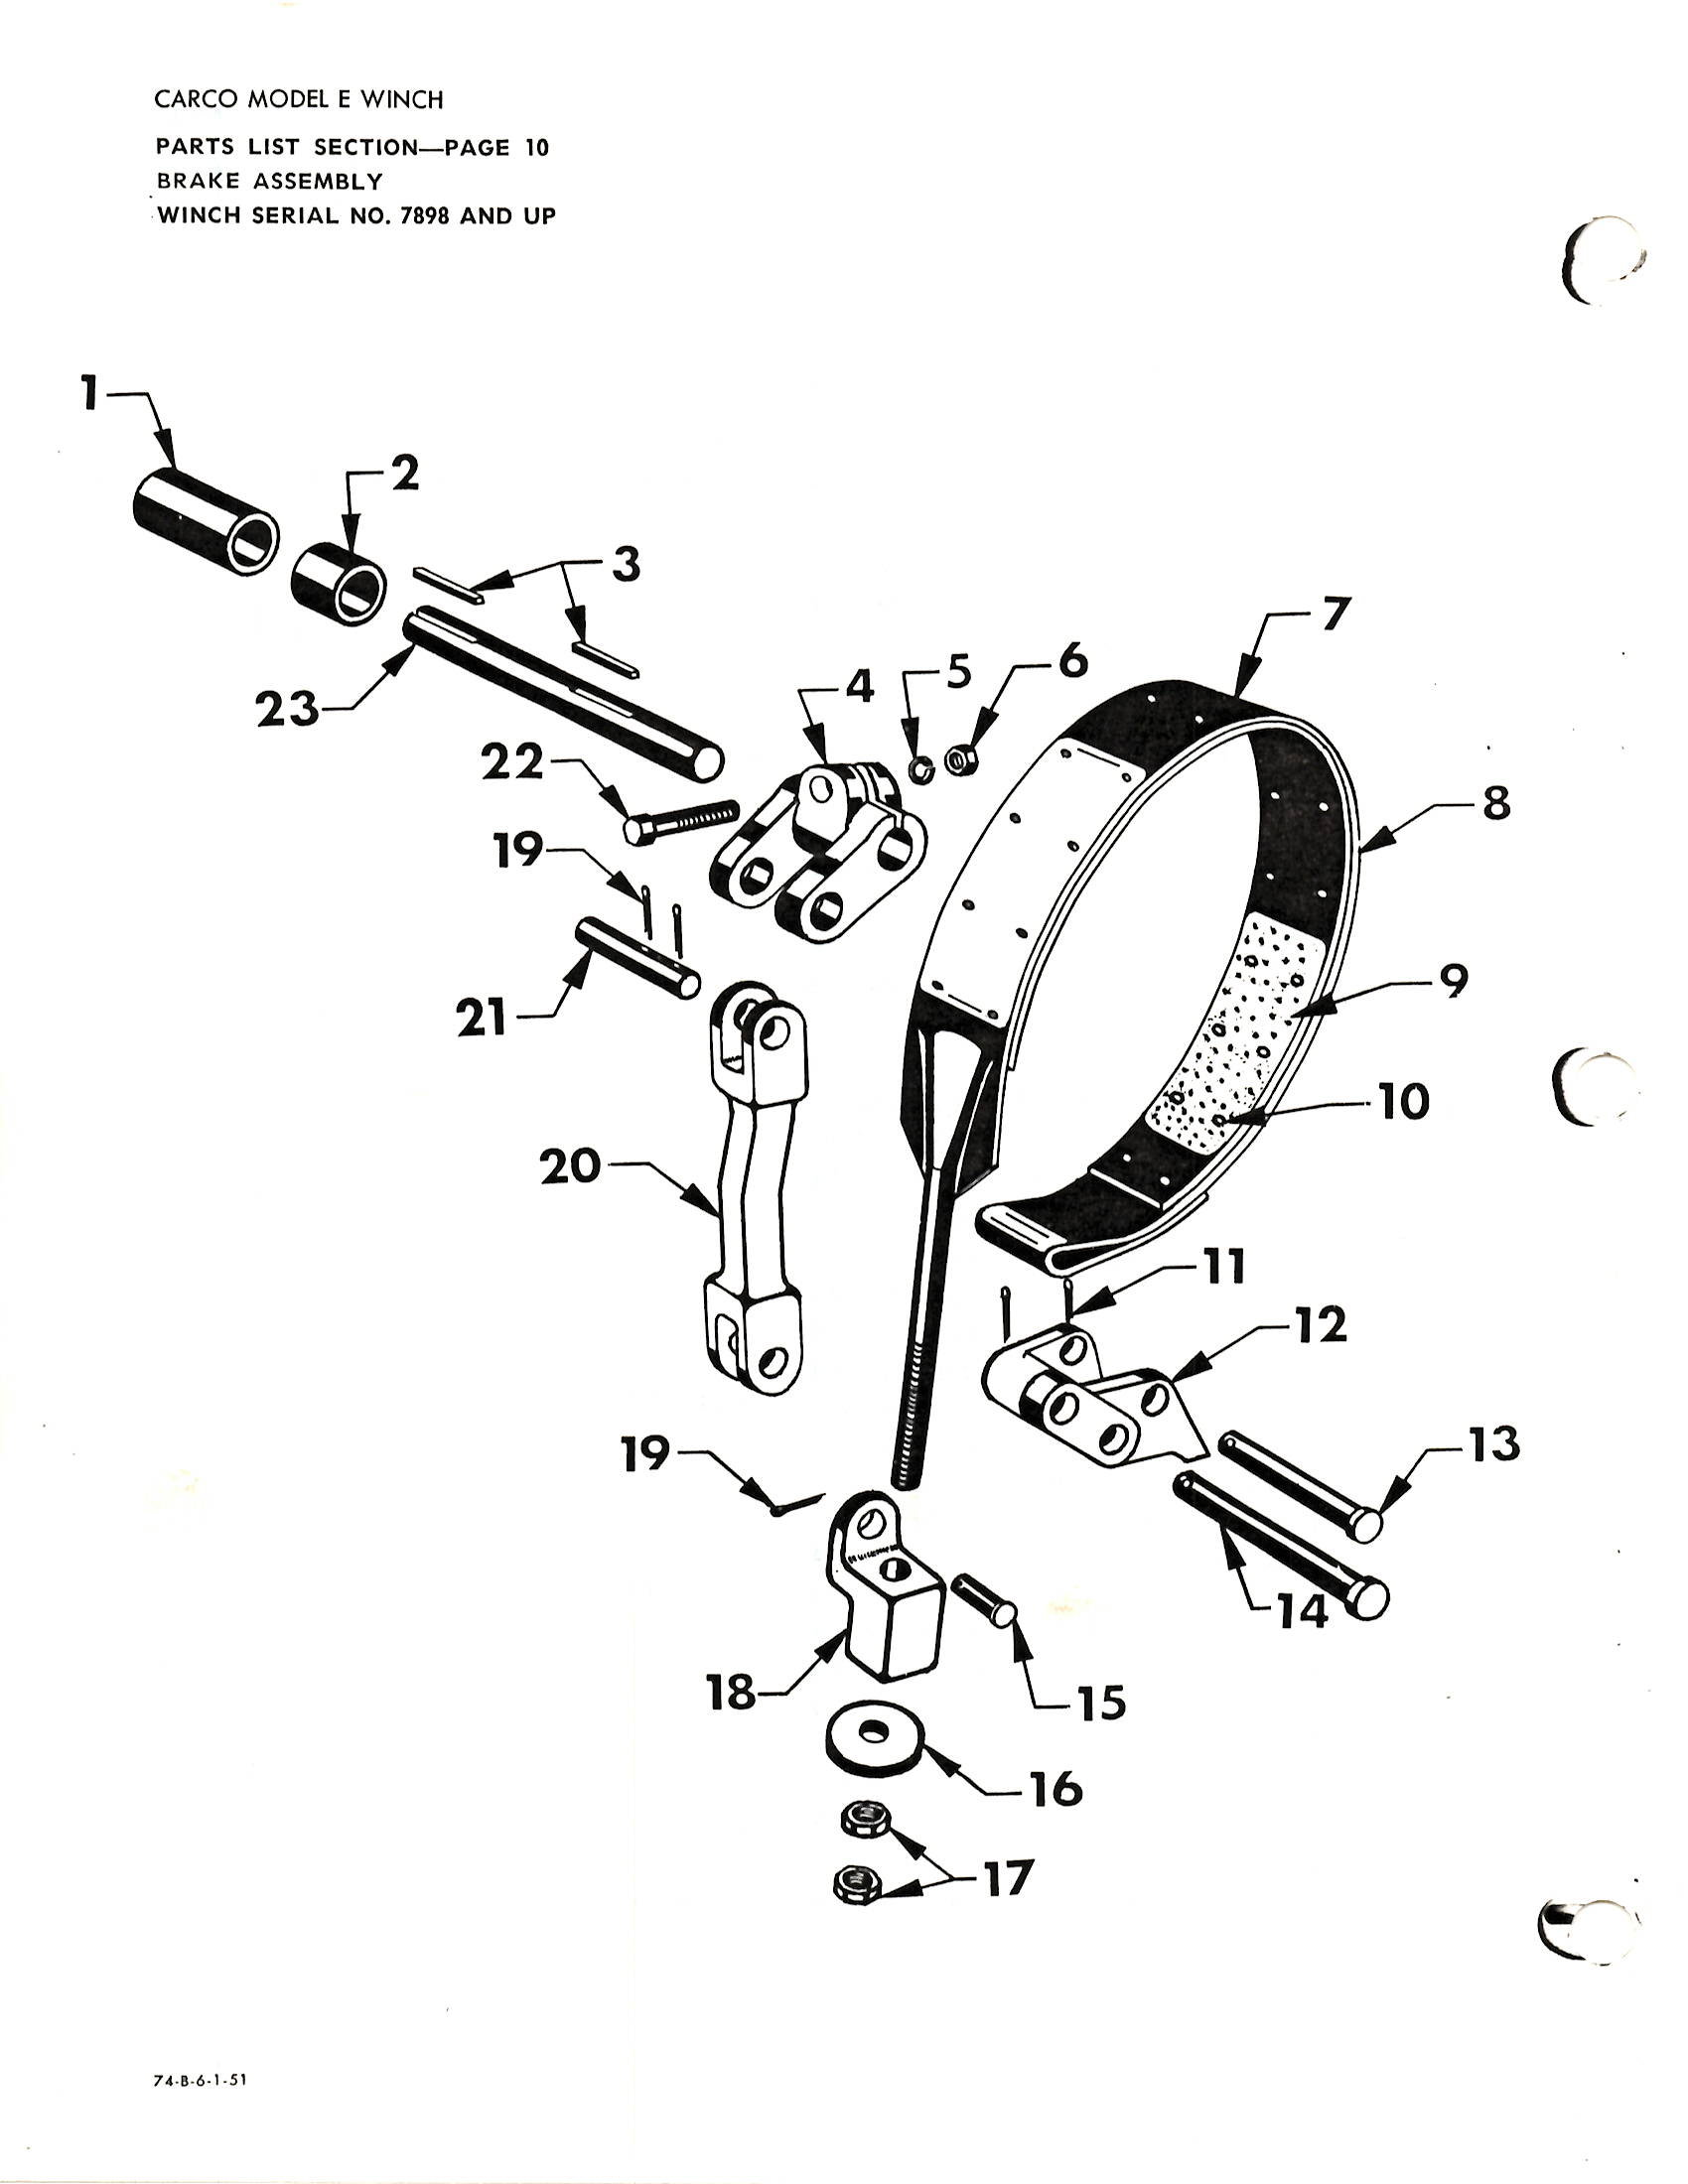 warn a2000 parts wiring diagram database Warn 12K Winch Wiring Diagram warn 12000 winch parts nemetas aufgegabelt info warn atv winch 2000 lb warn a2000 parts source warn 62135 wiring diagram